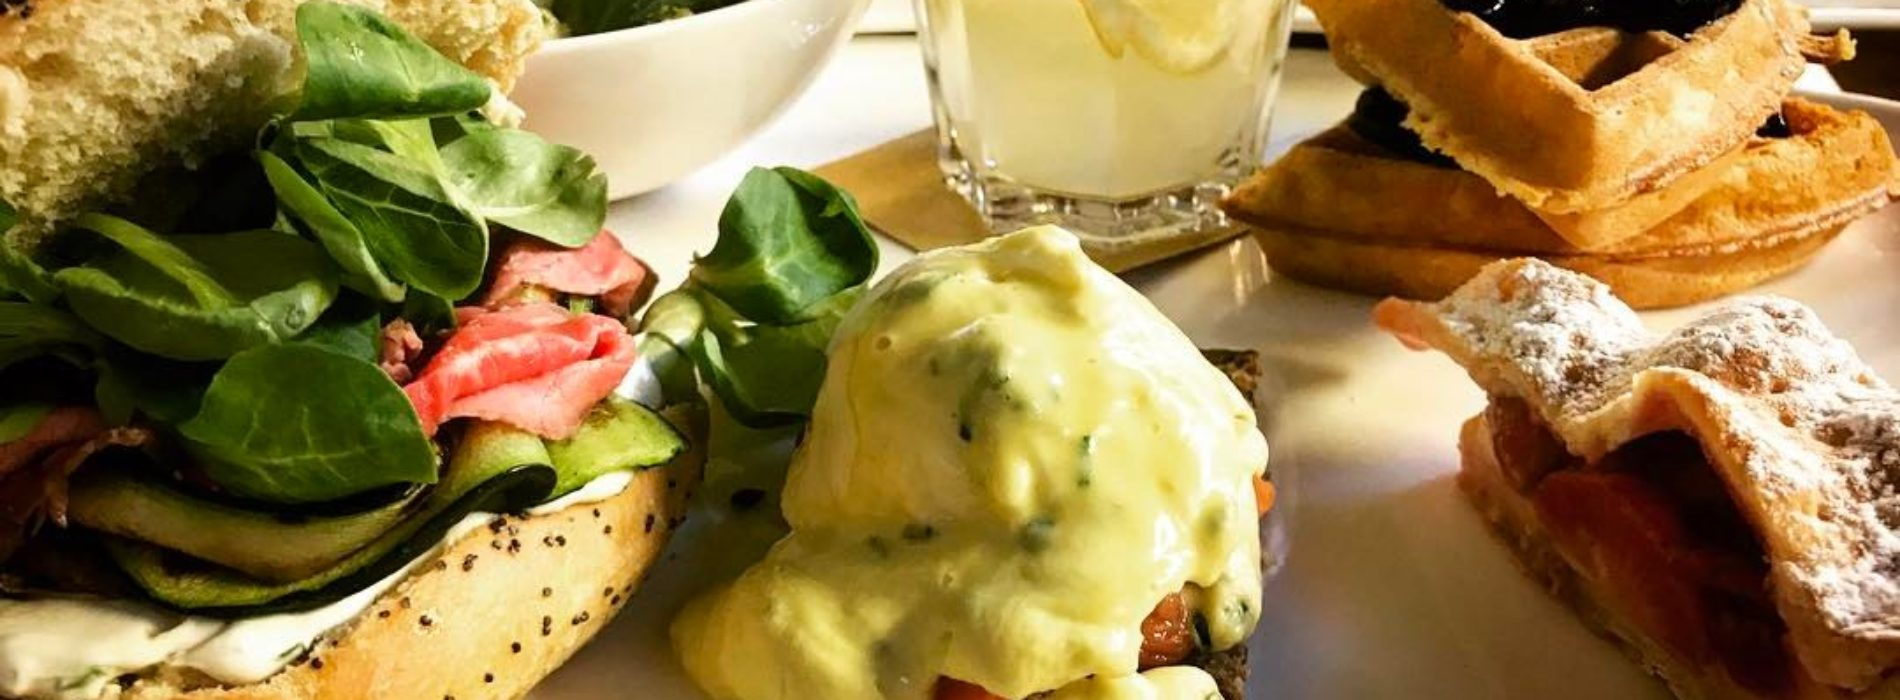 Brunch Roma aprile 2017: bagel sunday da Mavi, menu tipico romano da Hopside